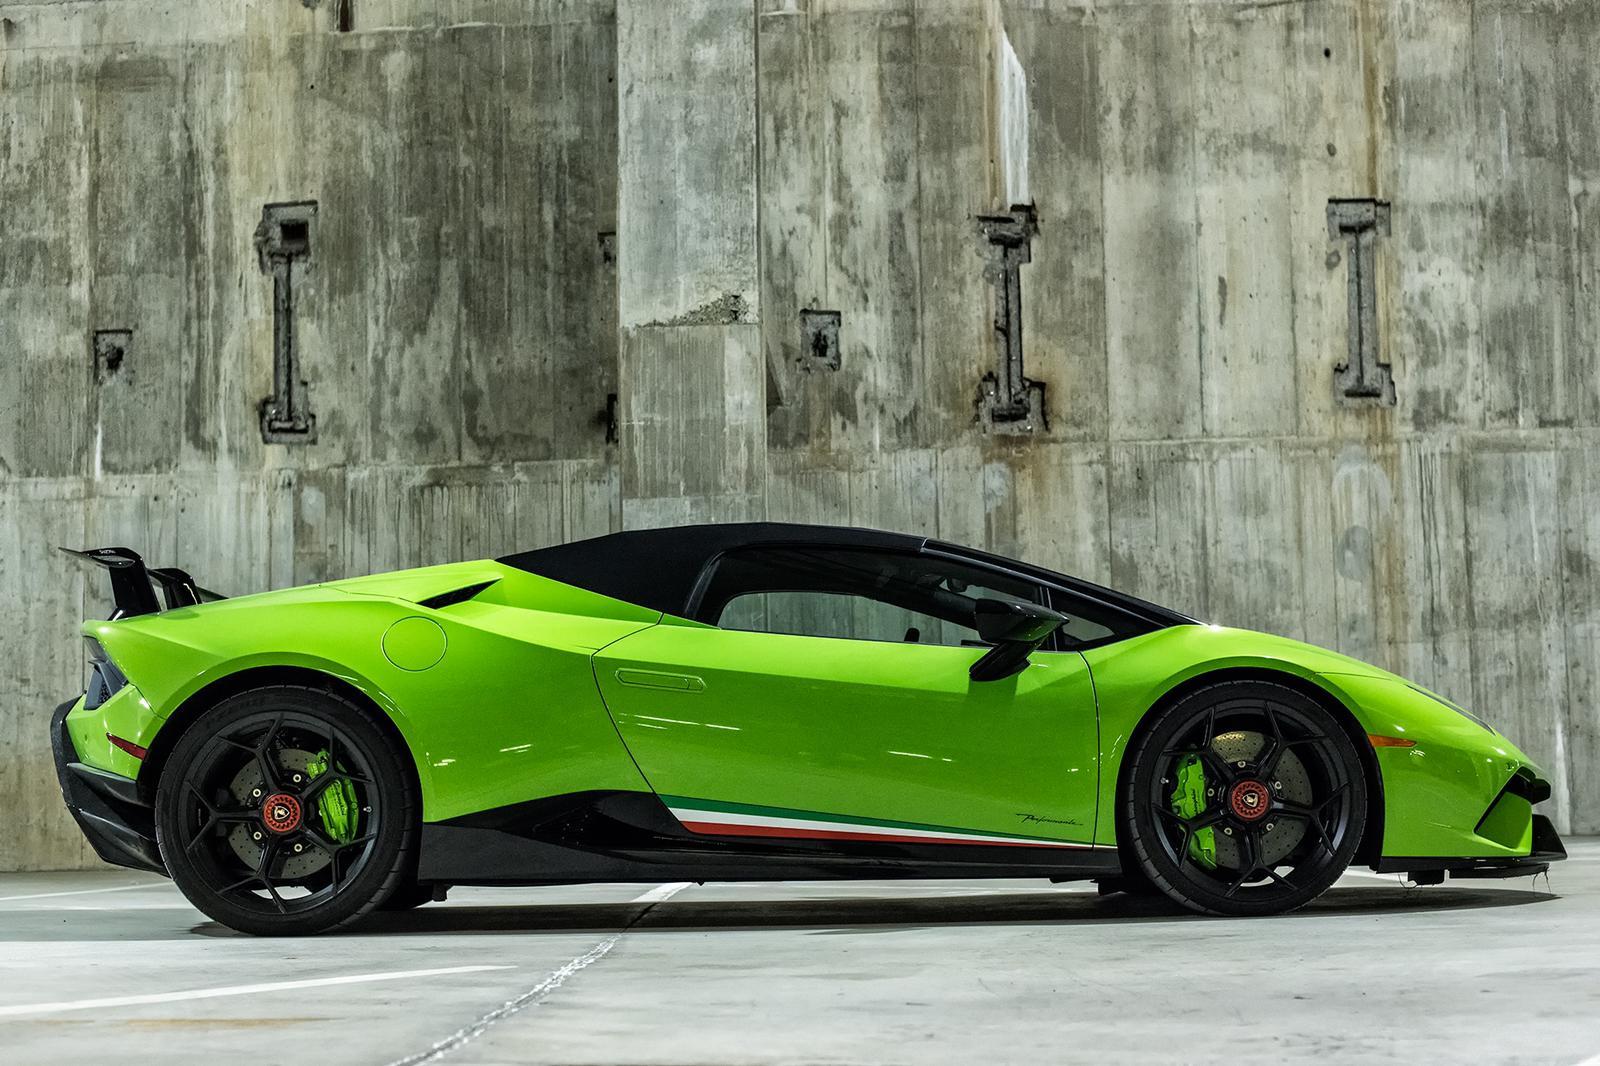 Lamborghini Huracán Performante spyder verde a noleggio